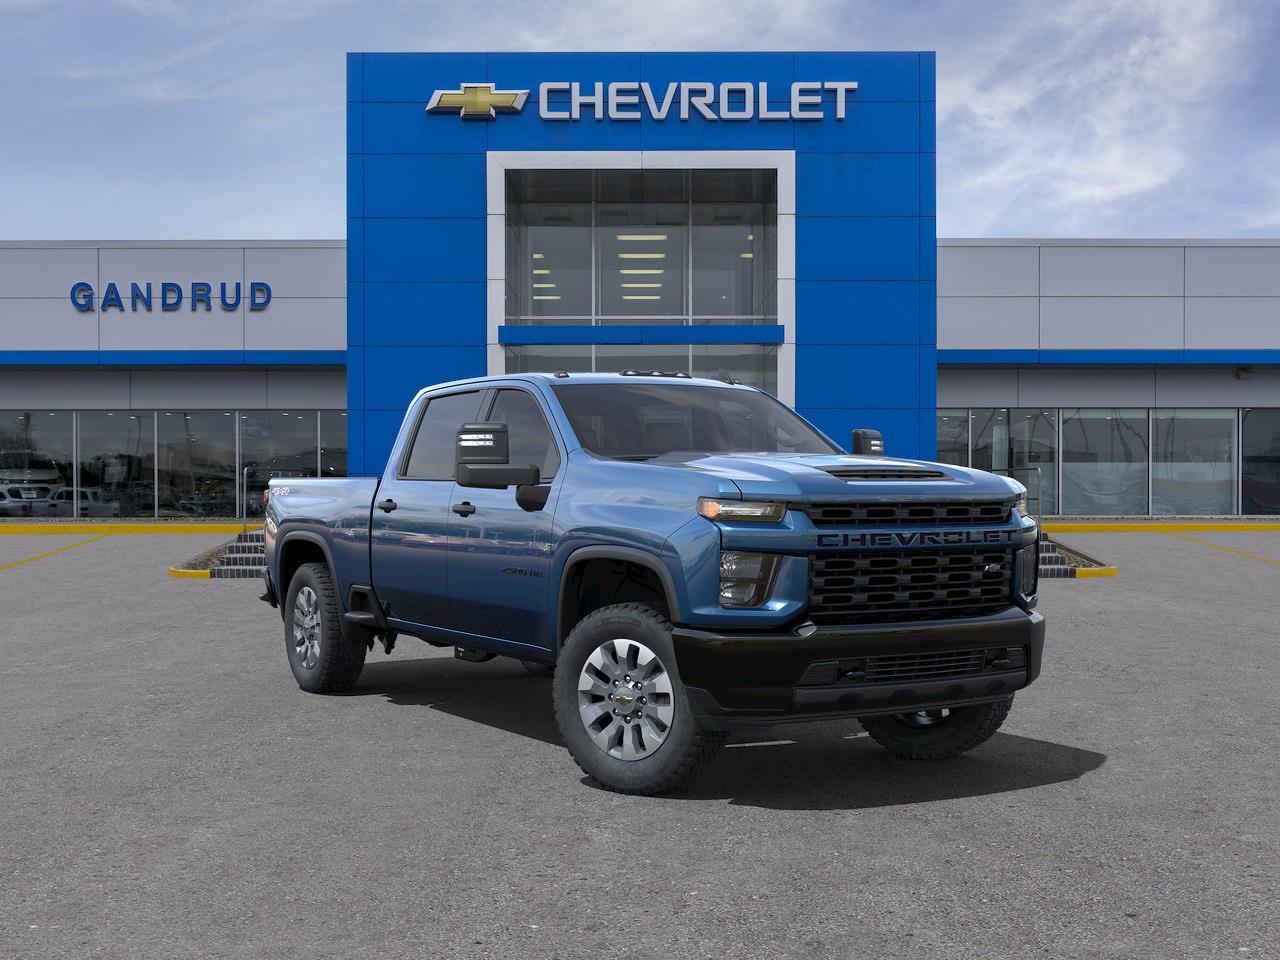 2021 Chevrolet Silverado 2500 Crew Cab 4x4, Pickup #M1388 - photo 1